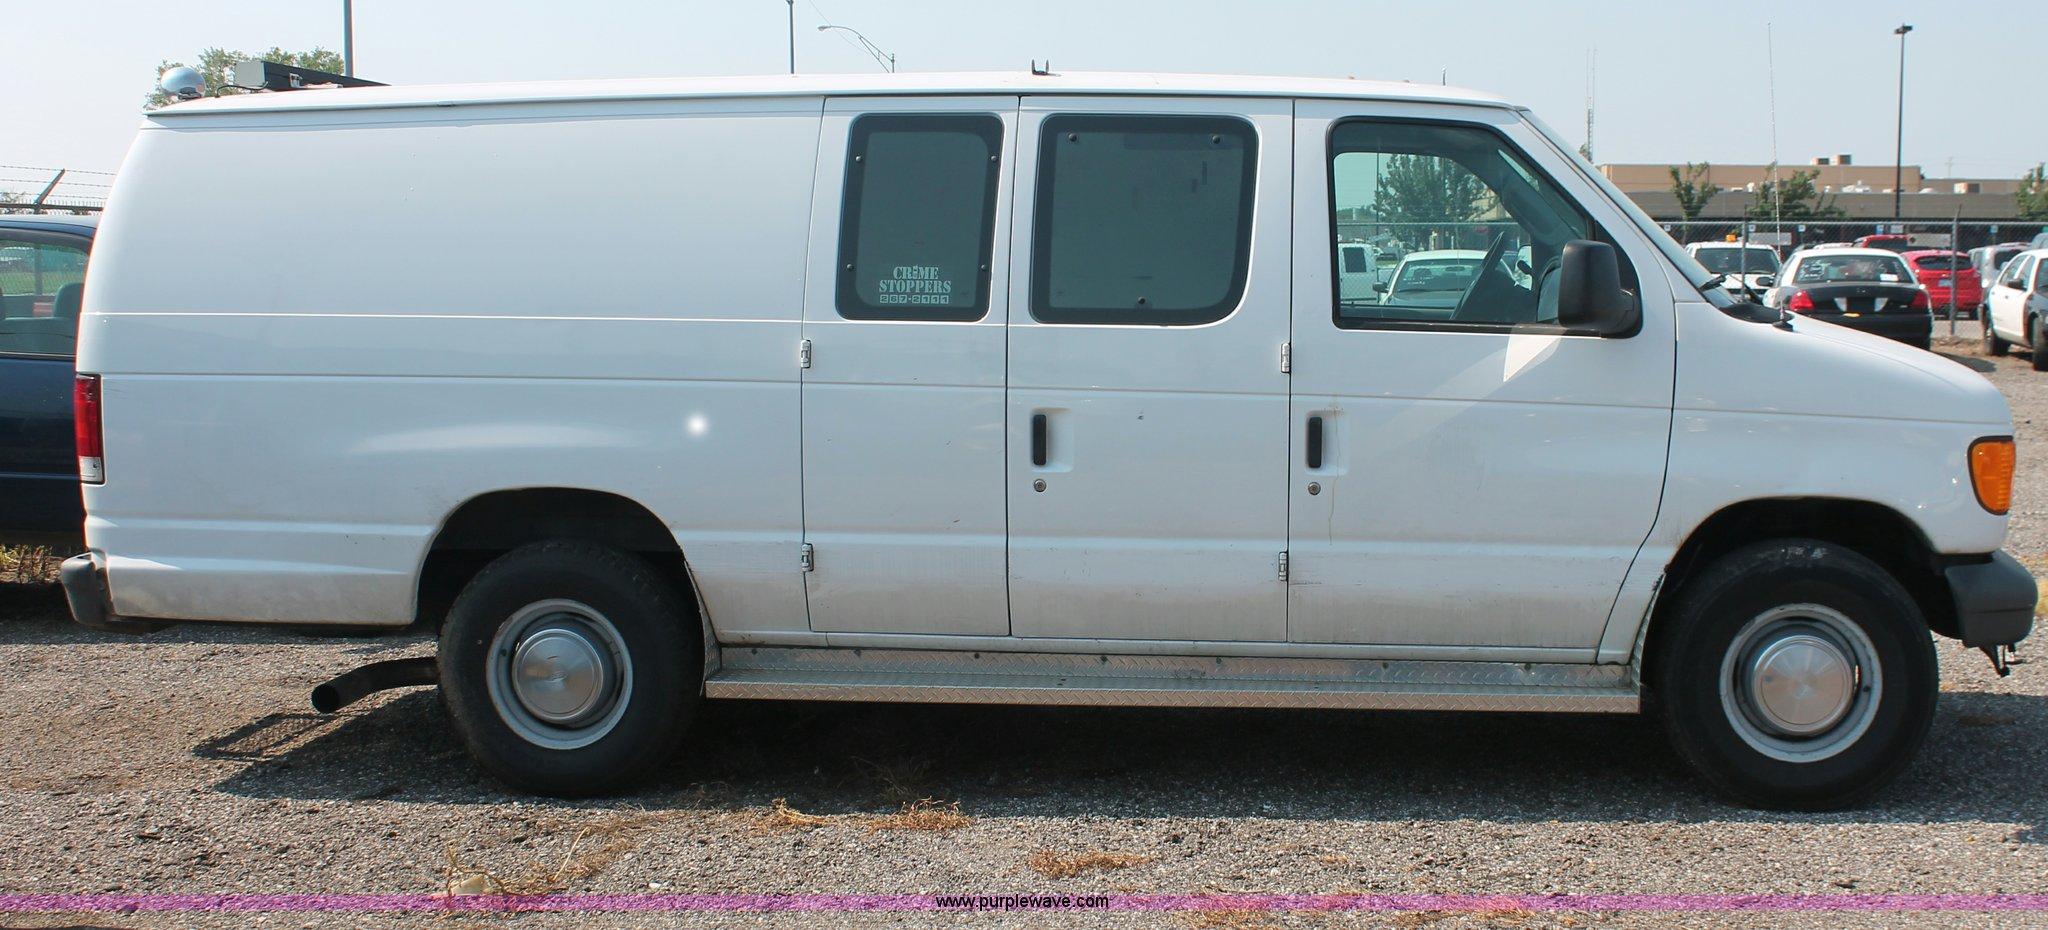 2000 ford e 350 super duty extended cargo van